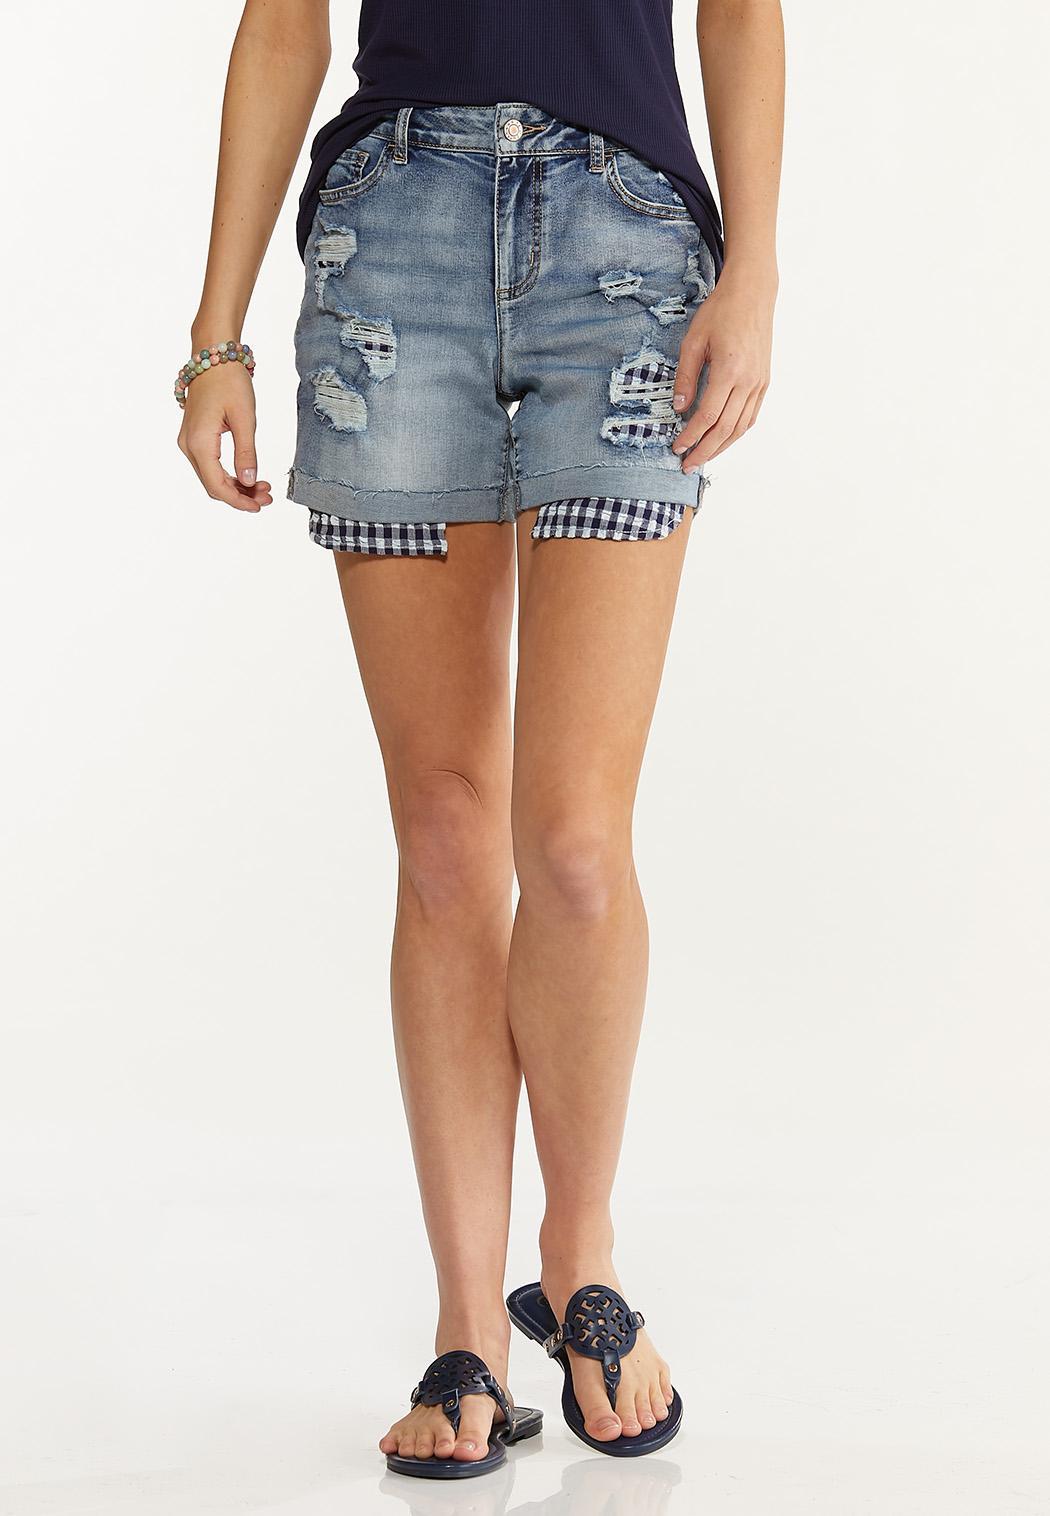 Distressed Gingham Denim Shorts